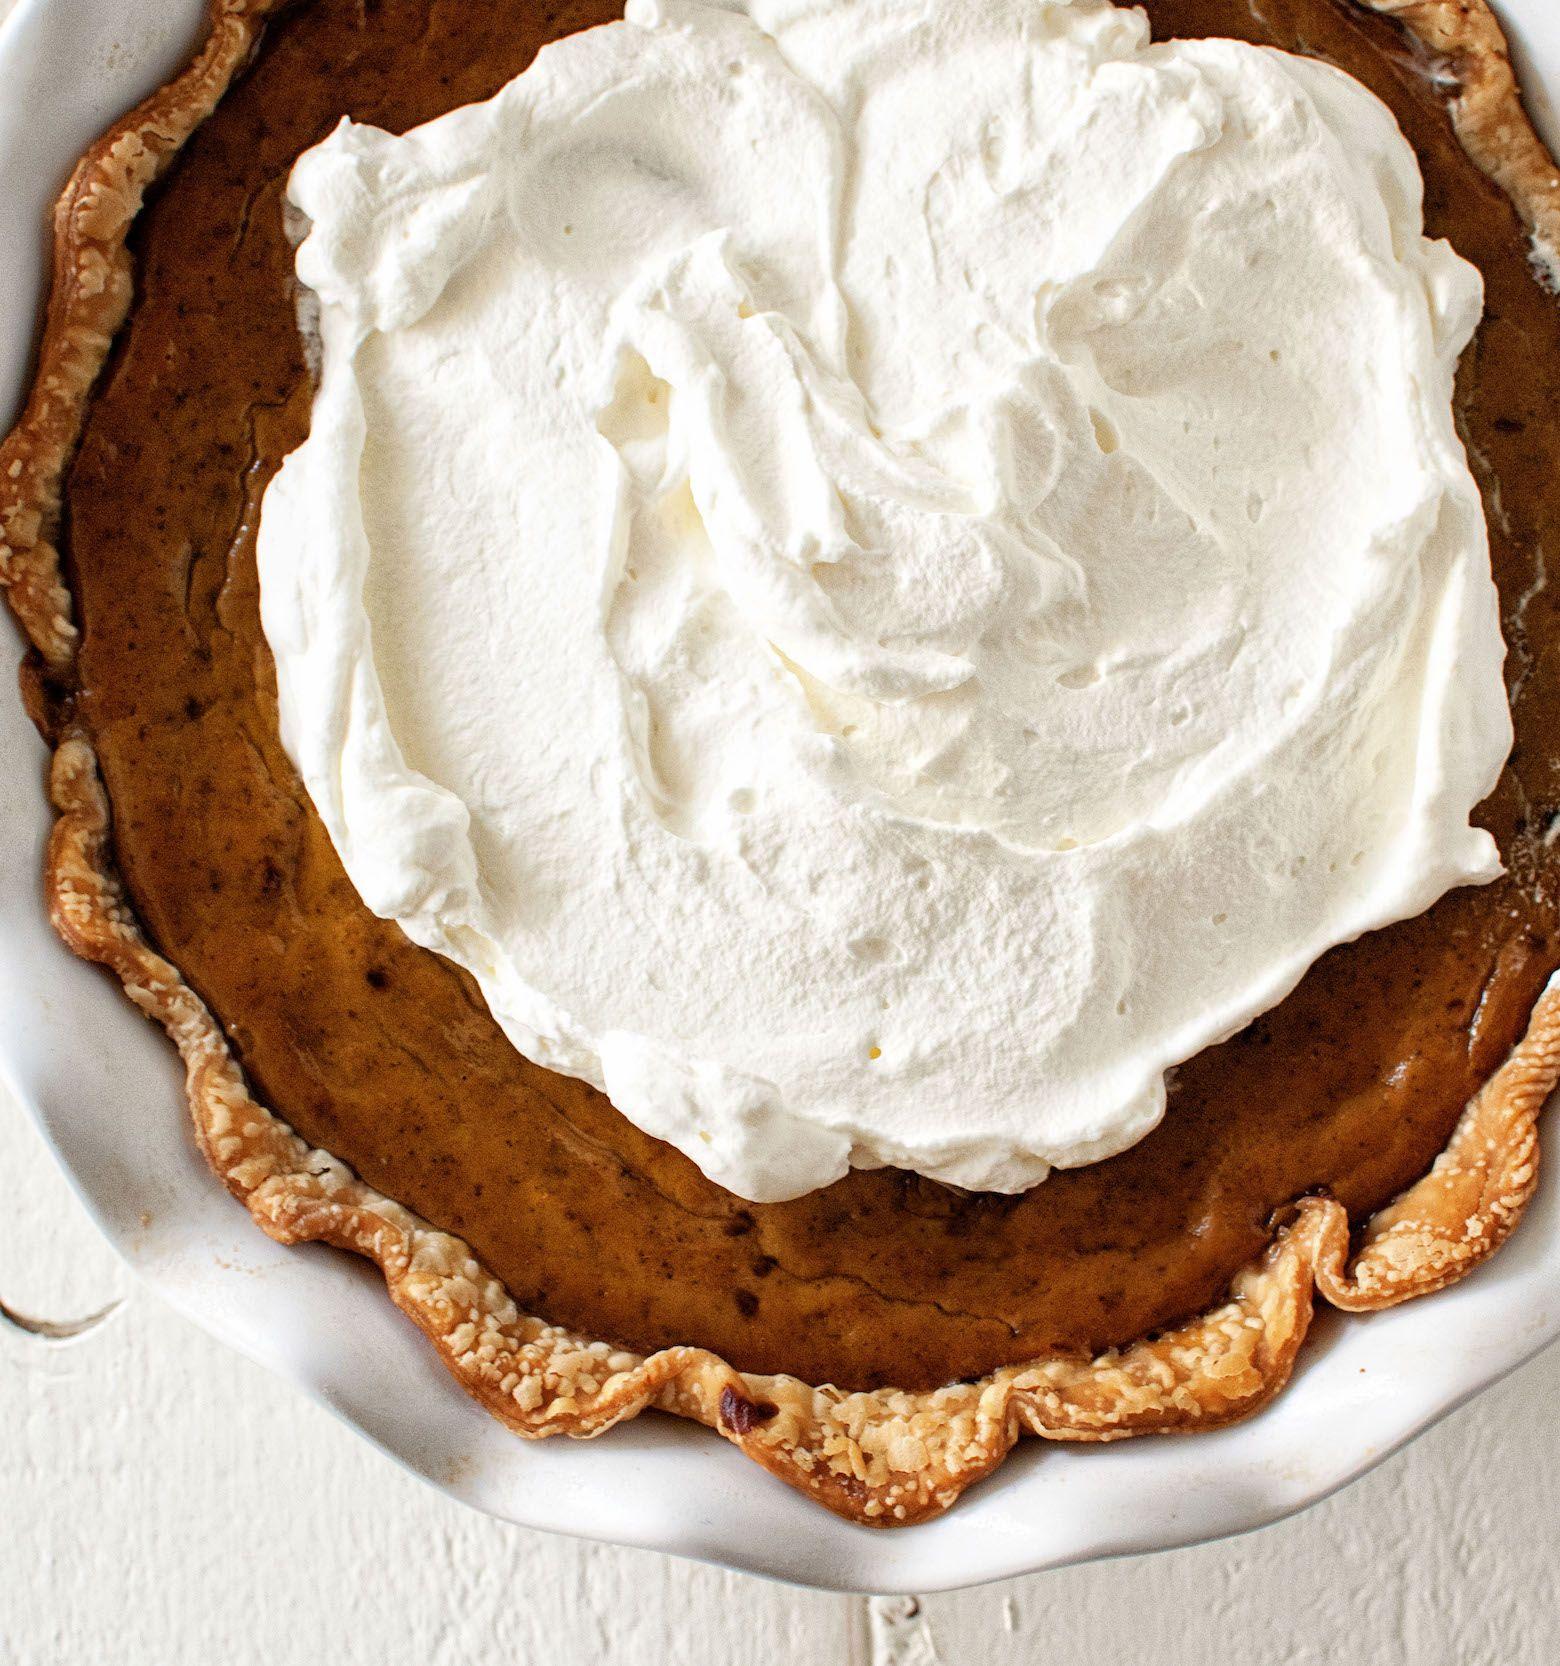 Get Your PSL Fix In Pie Form. Pumpkin Pie With Espresso